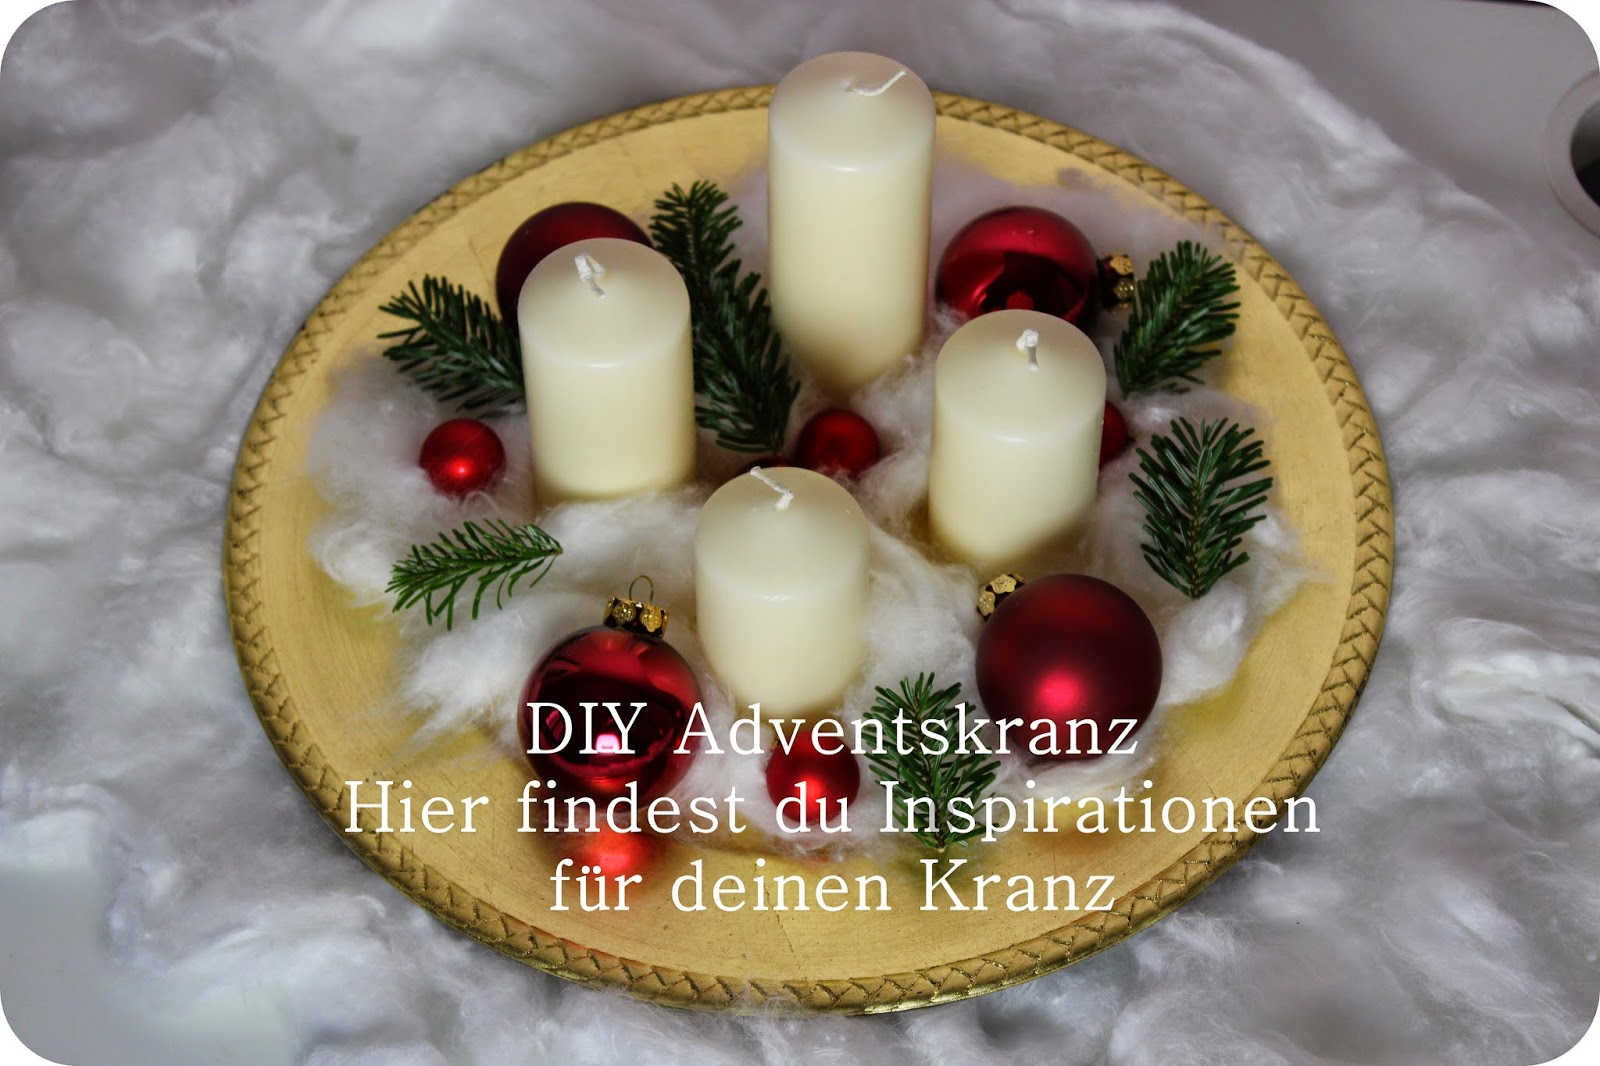 diy adventskranz inspirationen f r deinen kranz floral heart. Black Bedroom Furniture Sets. Home Design Ideas